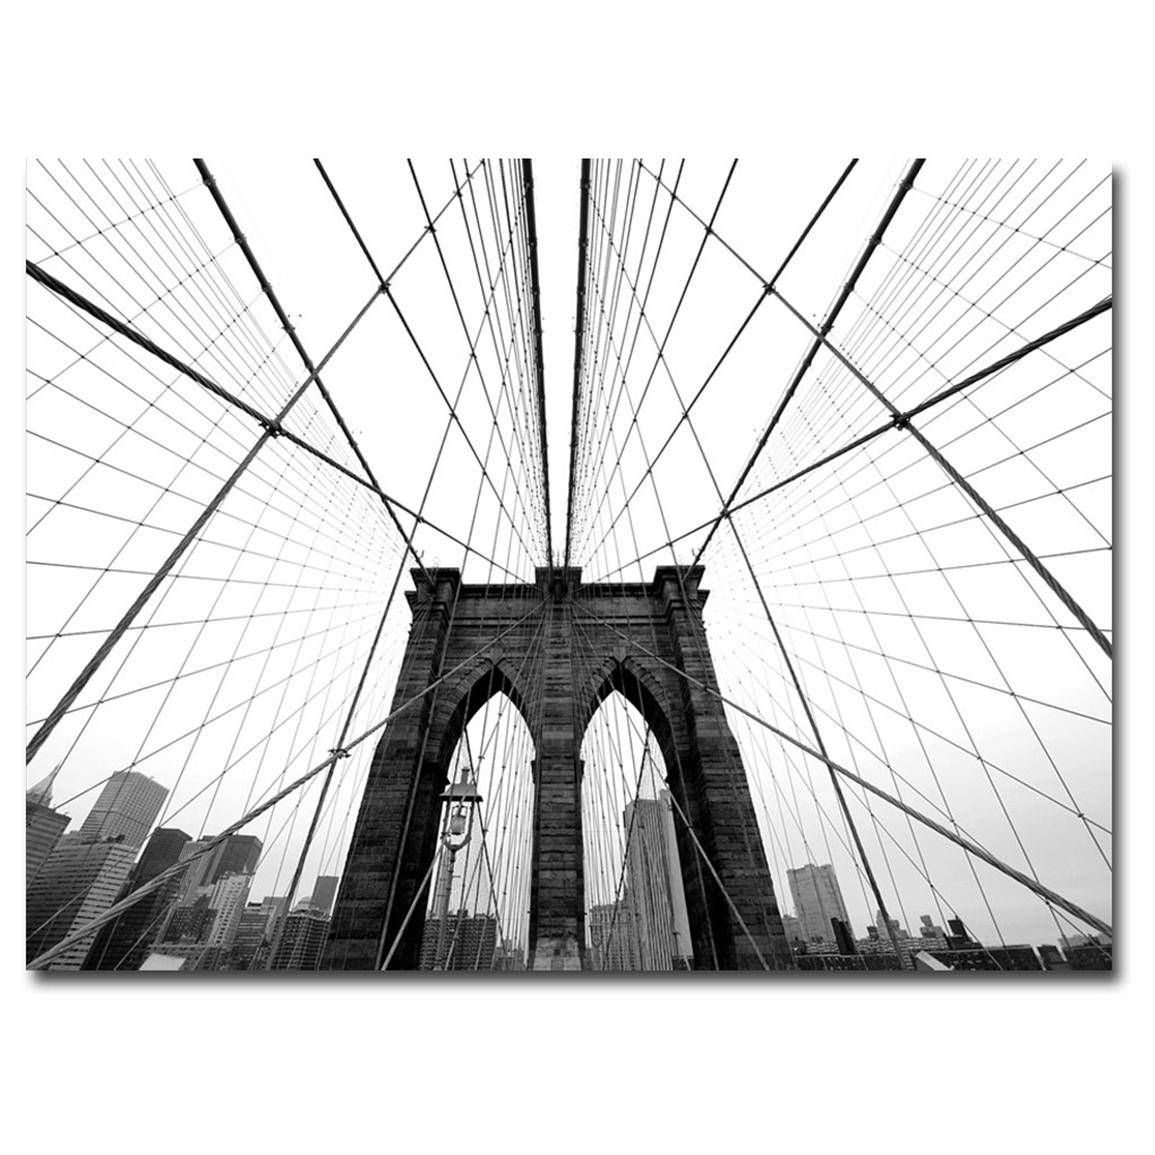 Delightful Ideas Brooklyn Wall Art Wondrous Inspration Nina Regarding Current Brooklyn Bridge Wall Decals (View 21 of 25)